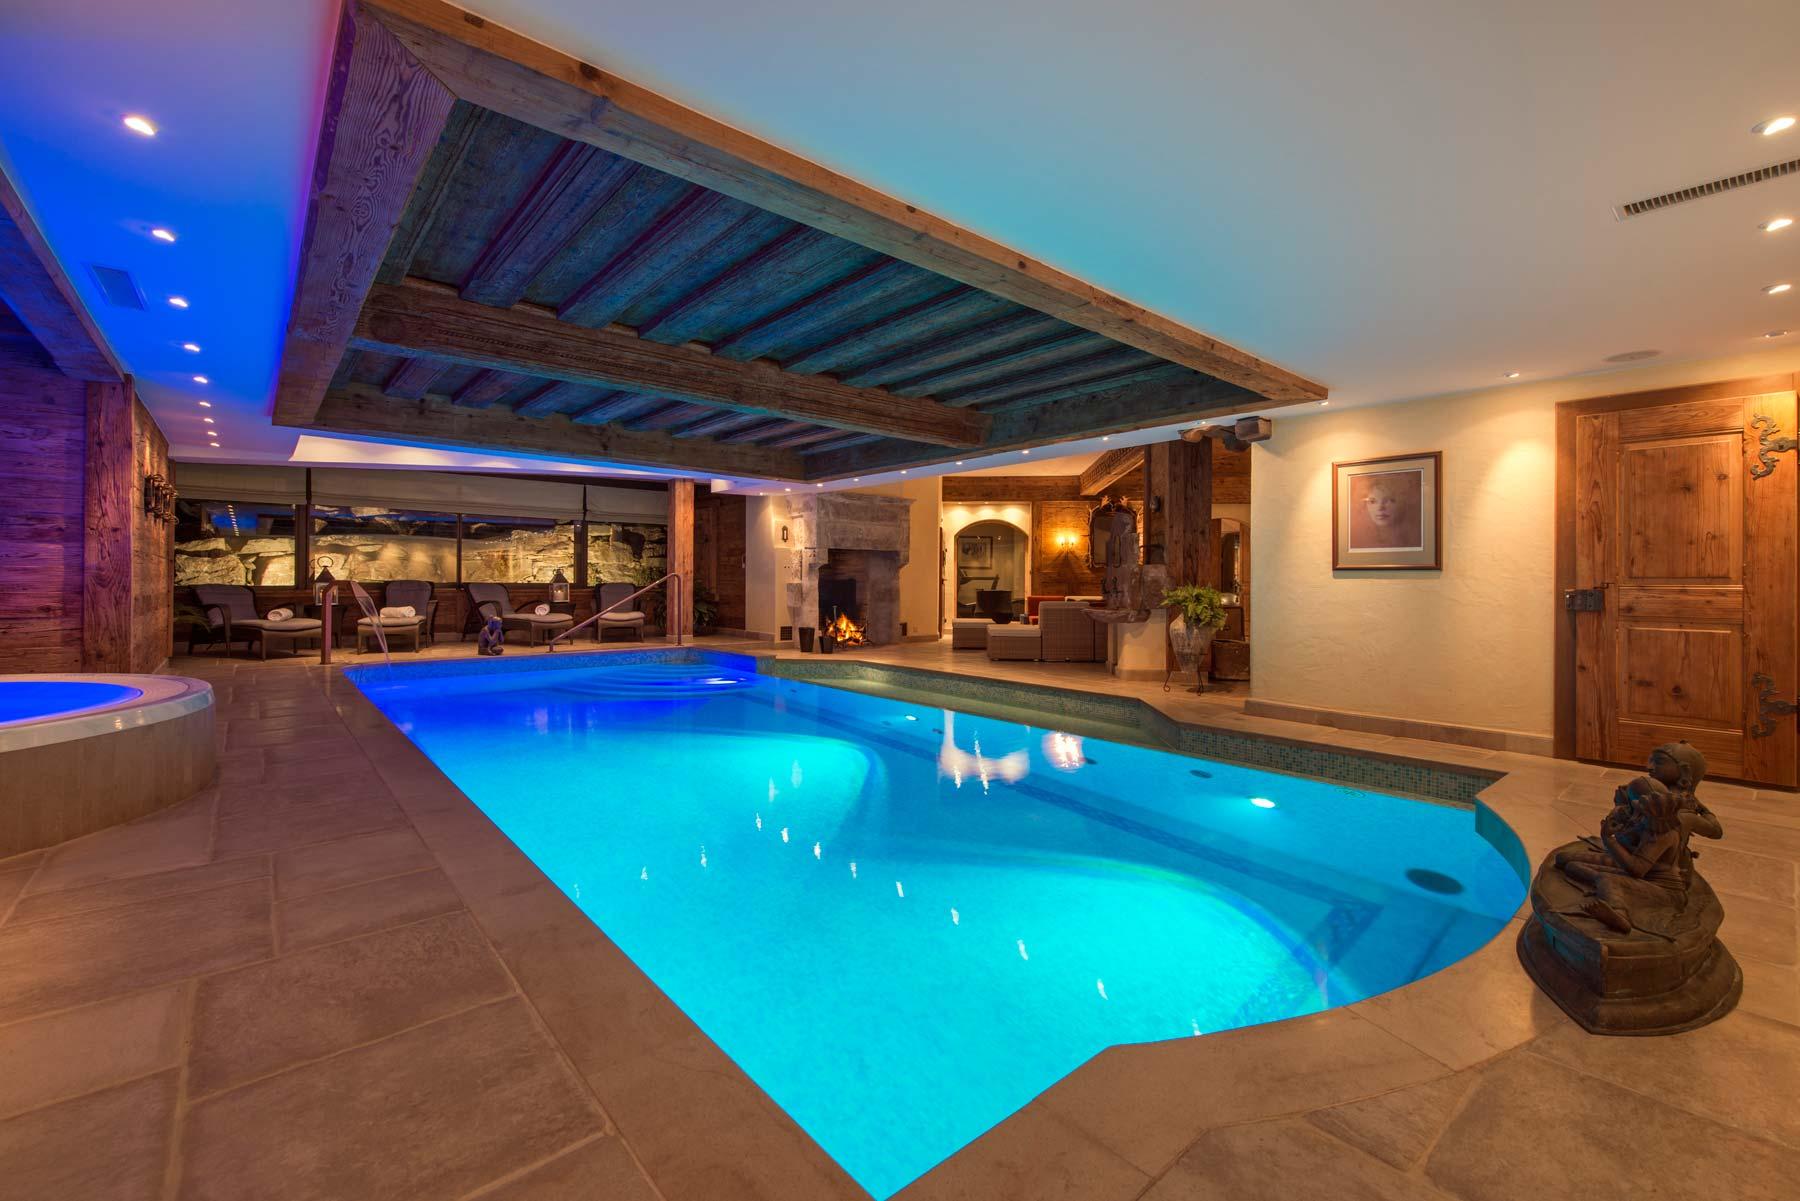 chalet-makini-swimming-pool-2